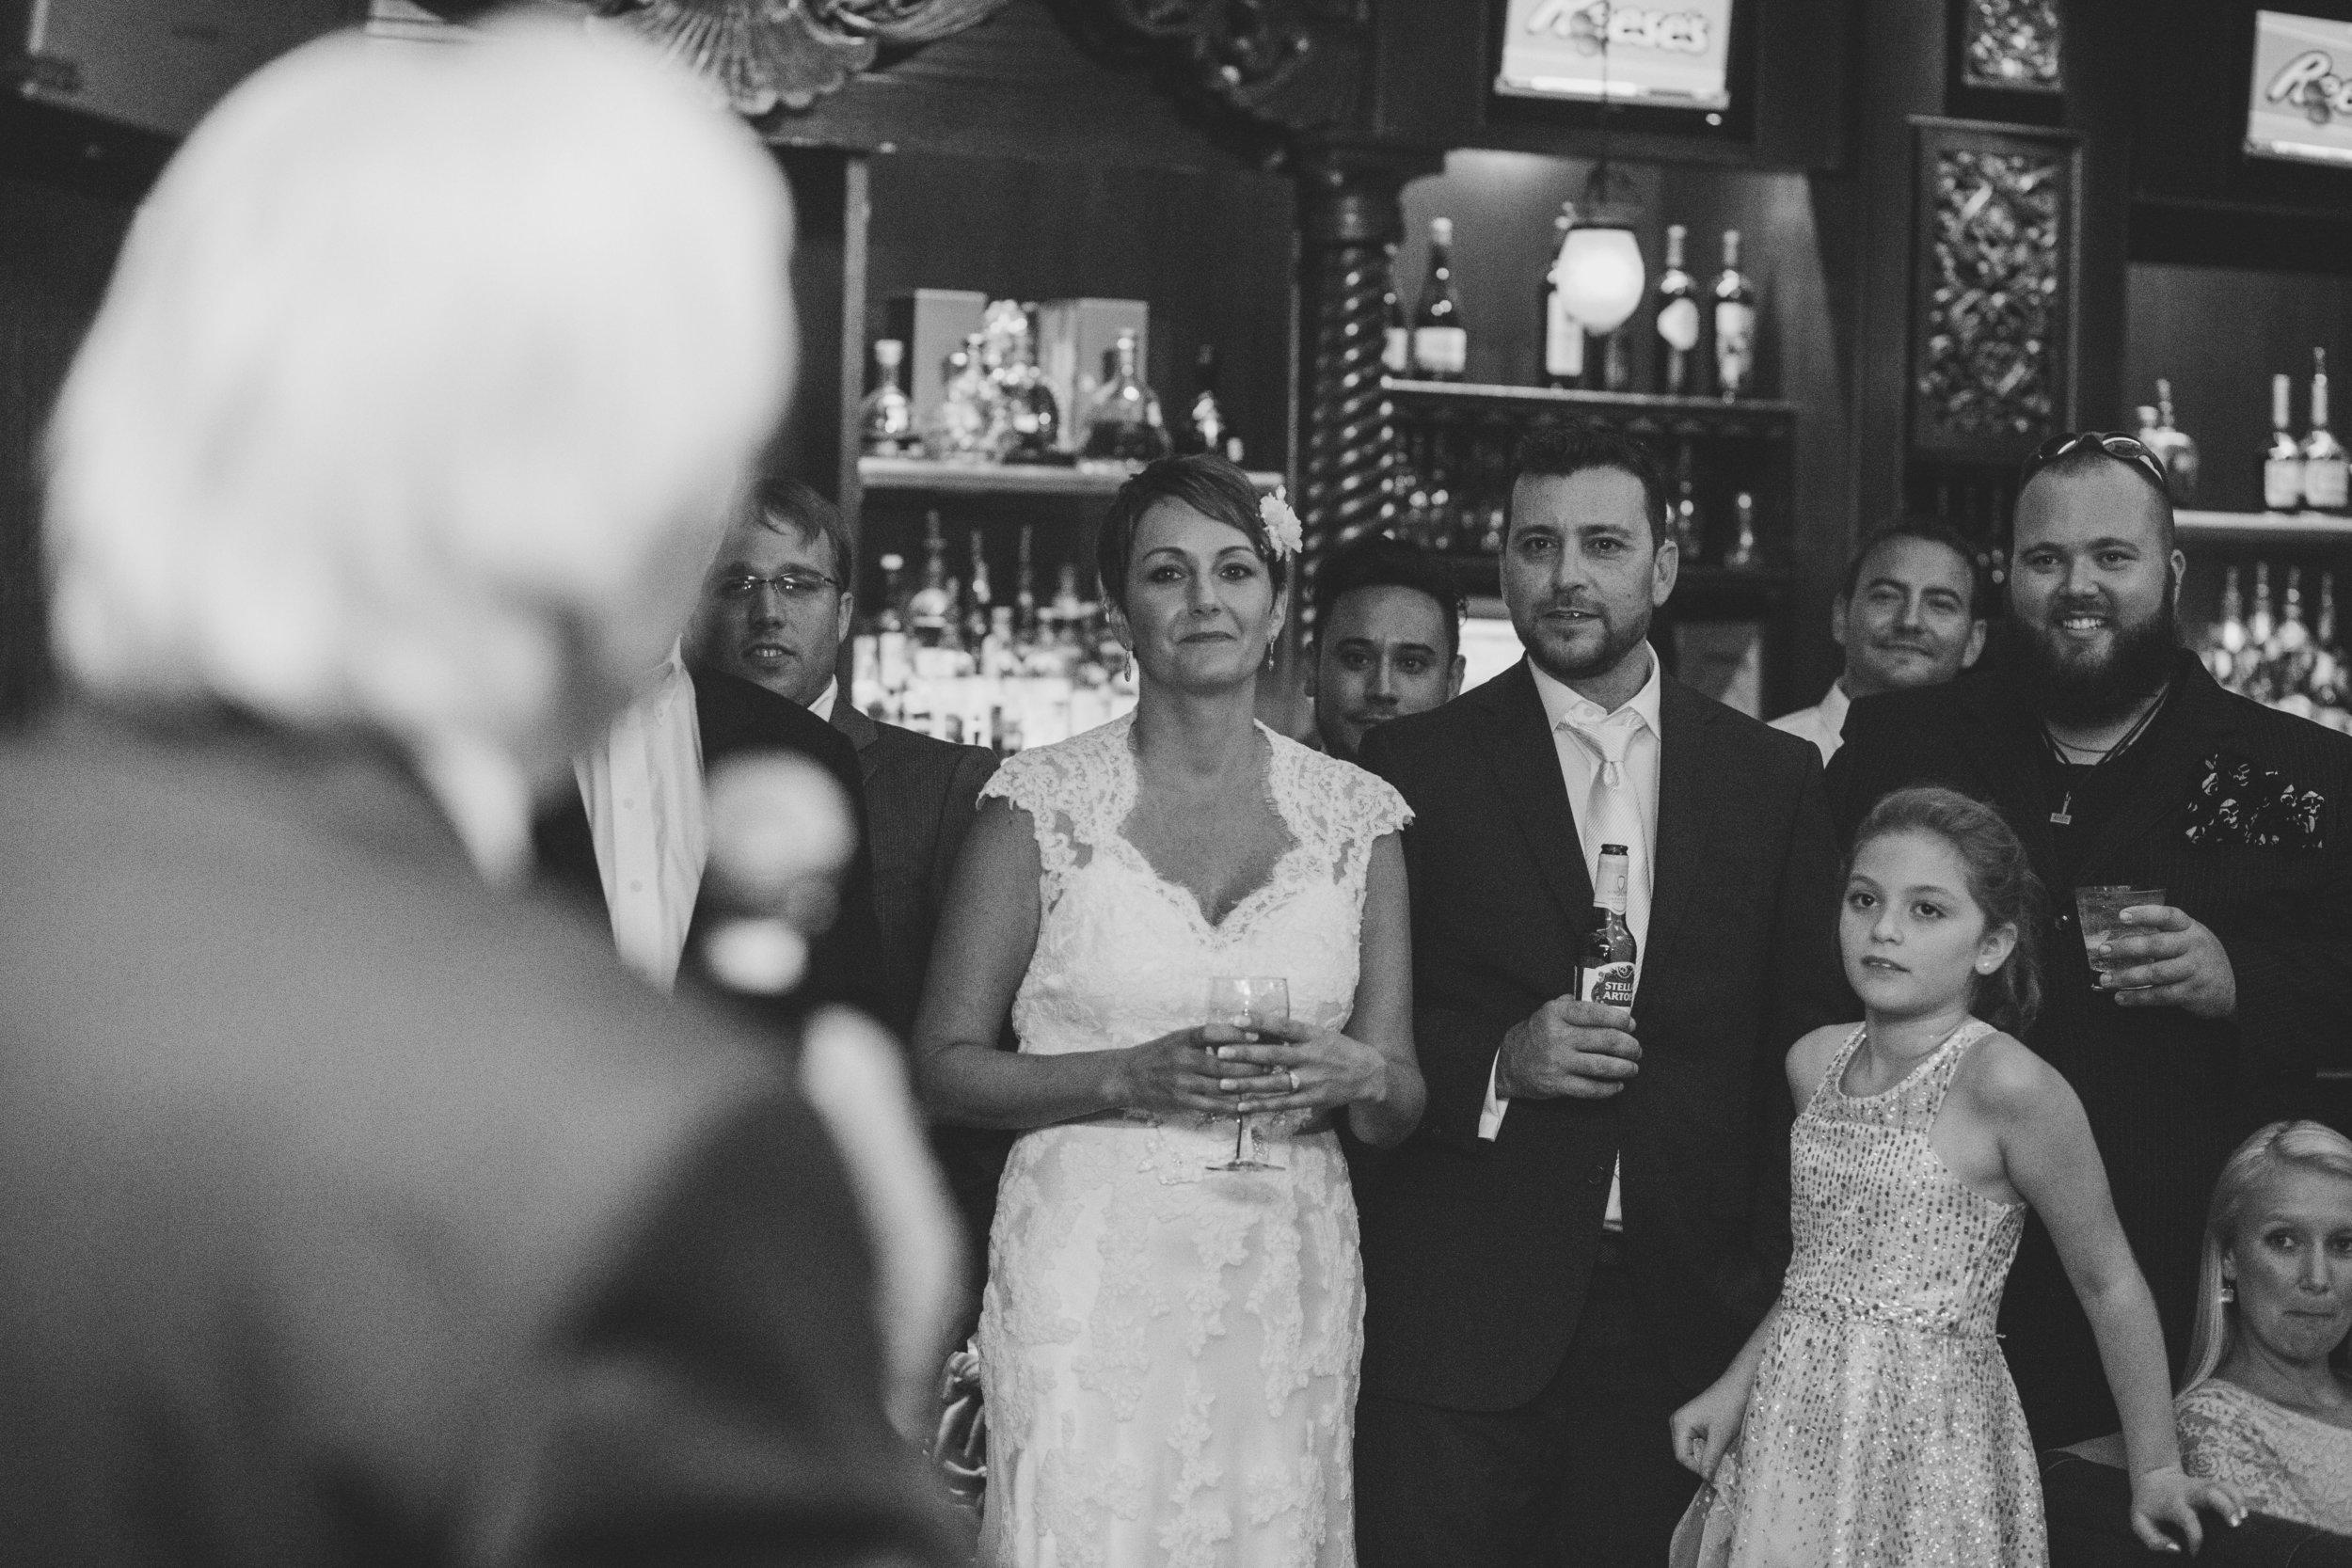 ATGI_Kat and Gabe Wedding 2016_2S8A5836.jpg